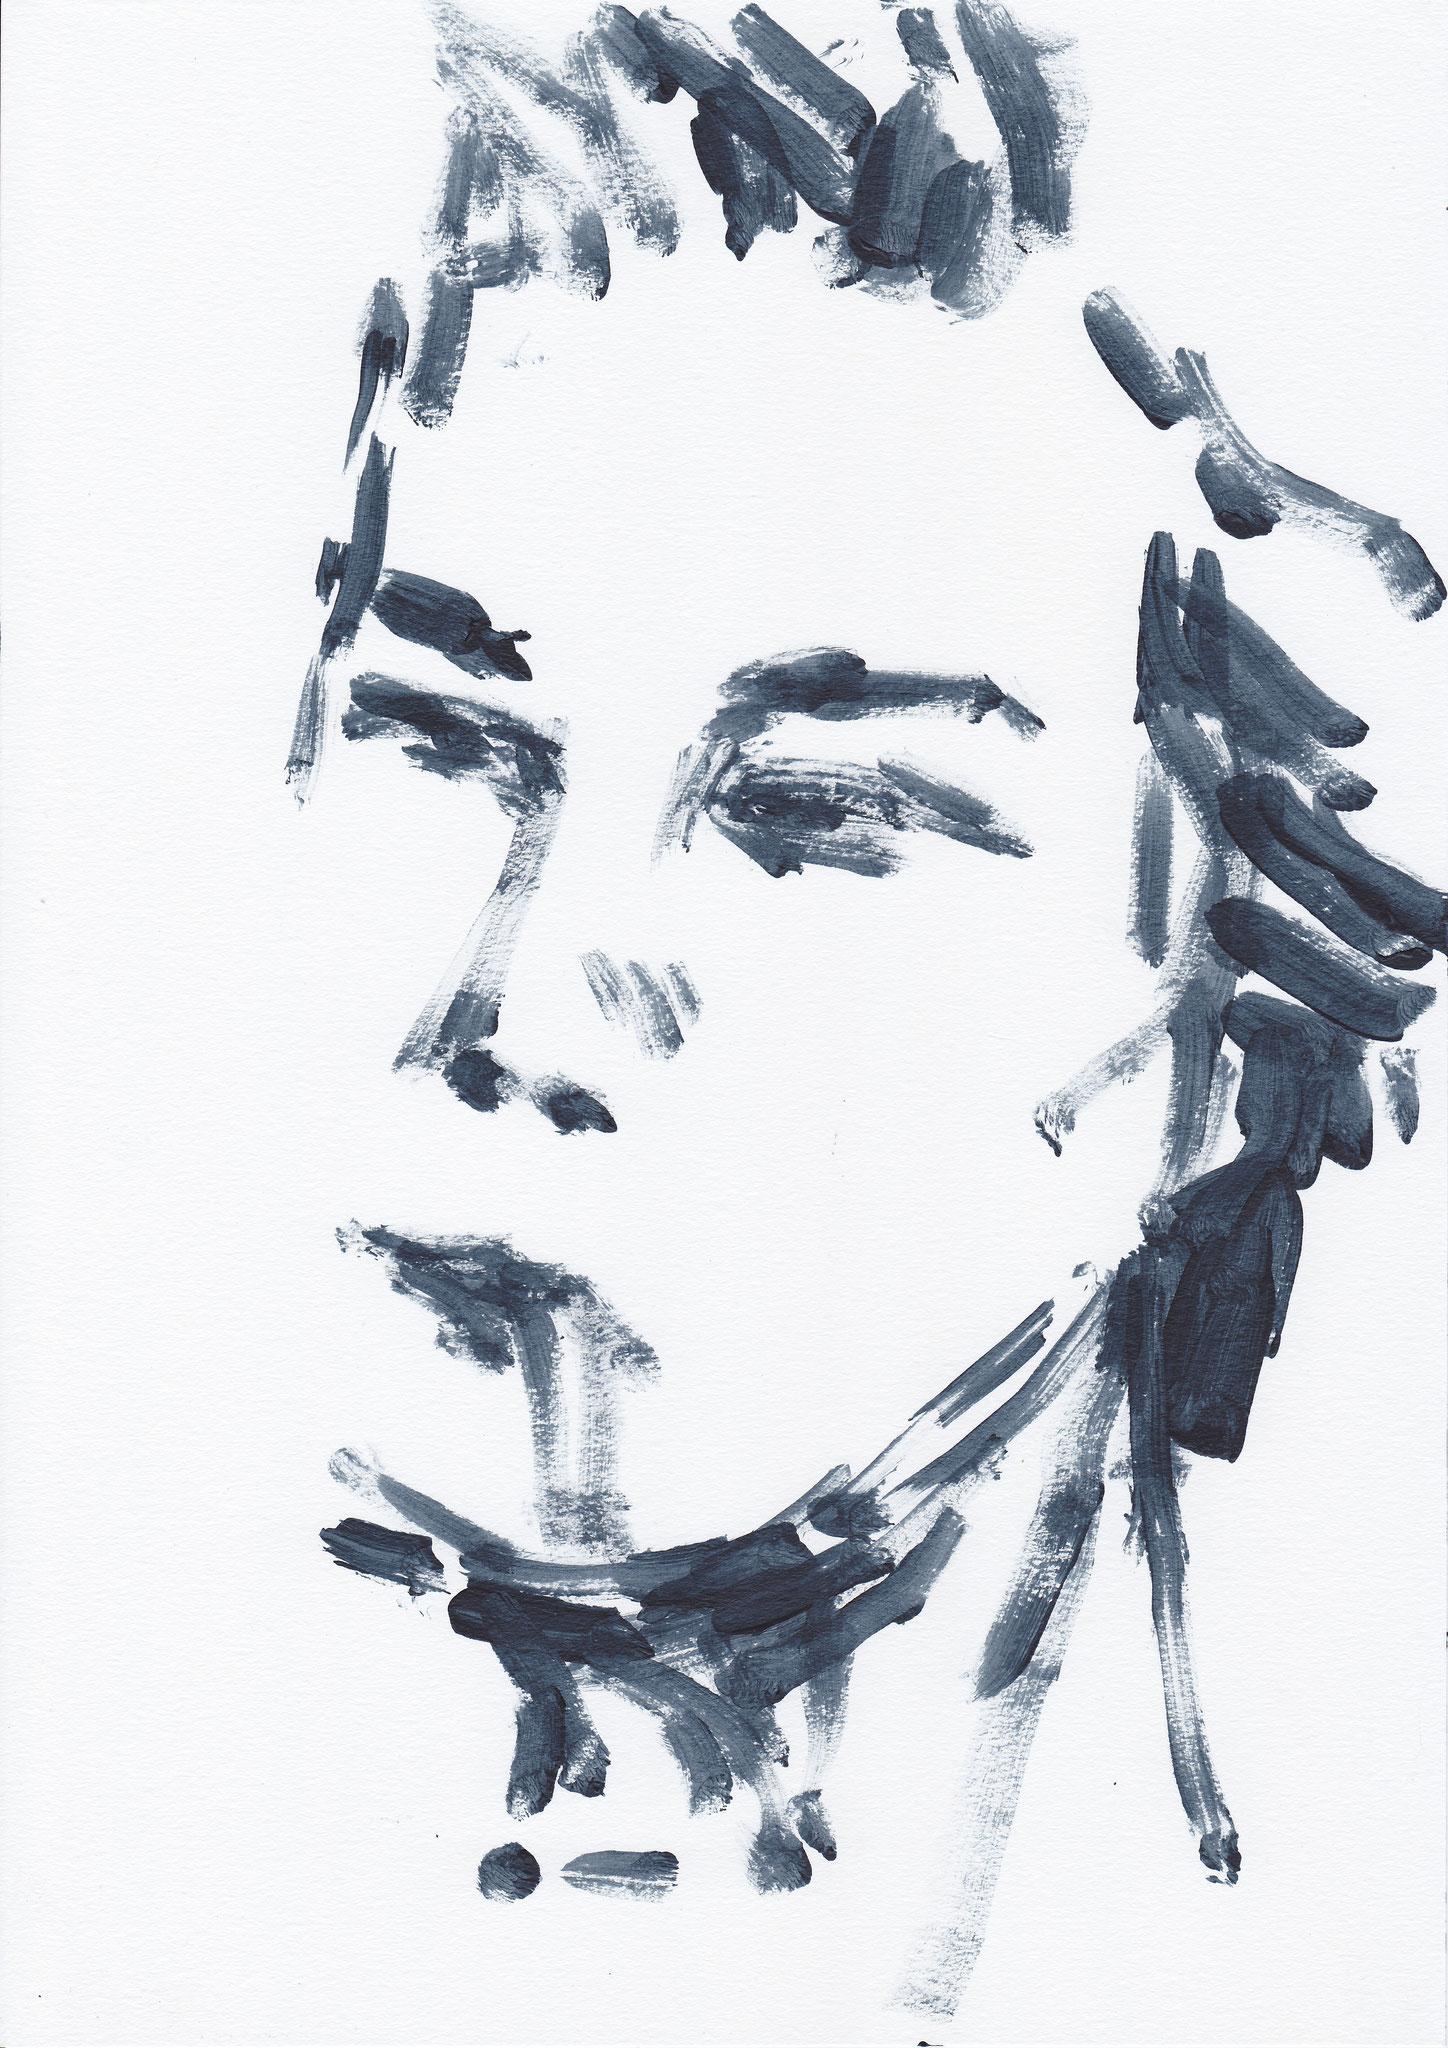 061 , acrylic on paper , 29.7 x 21cm , Selina Saranova